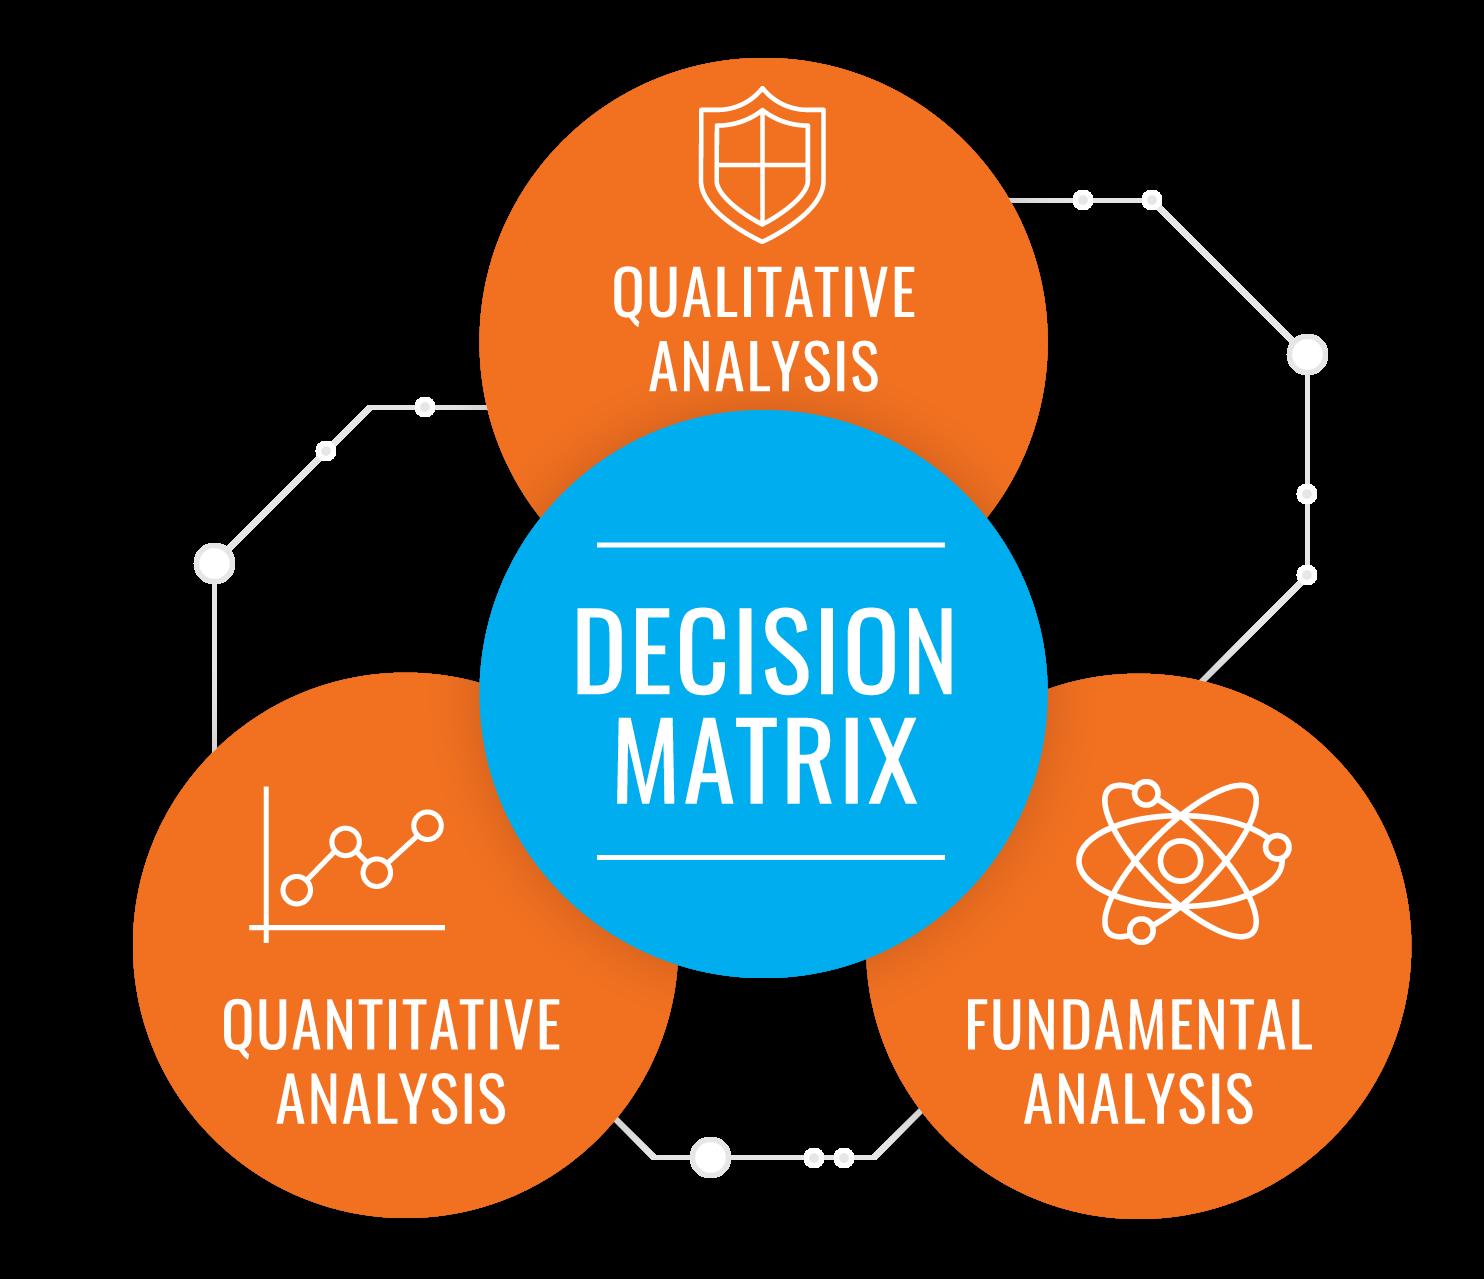 decision-matrix-for-harvestone-group-llc-lines.png